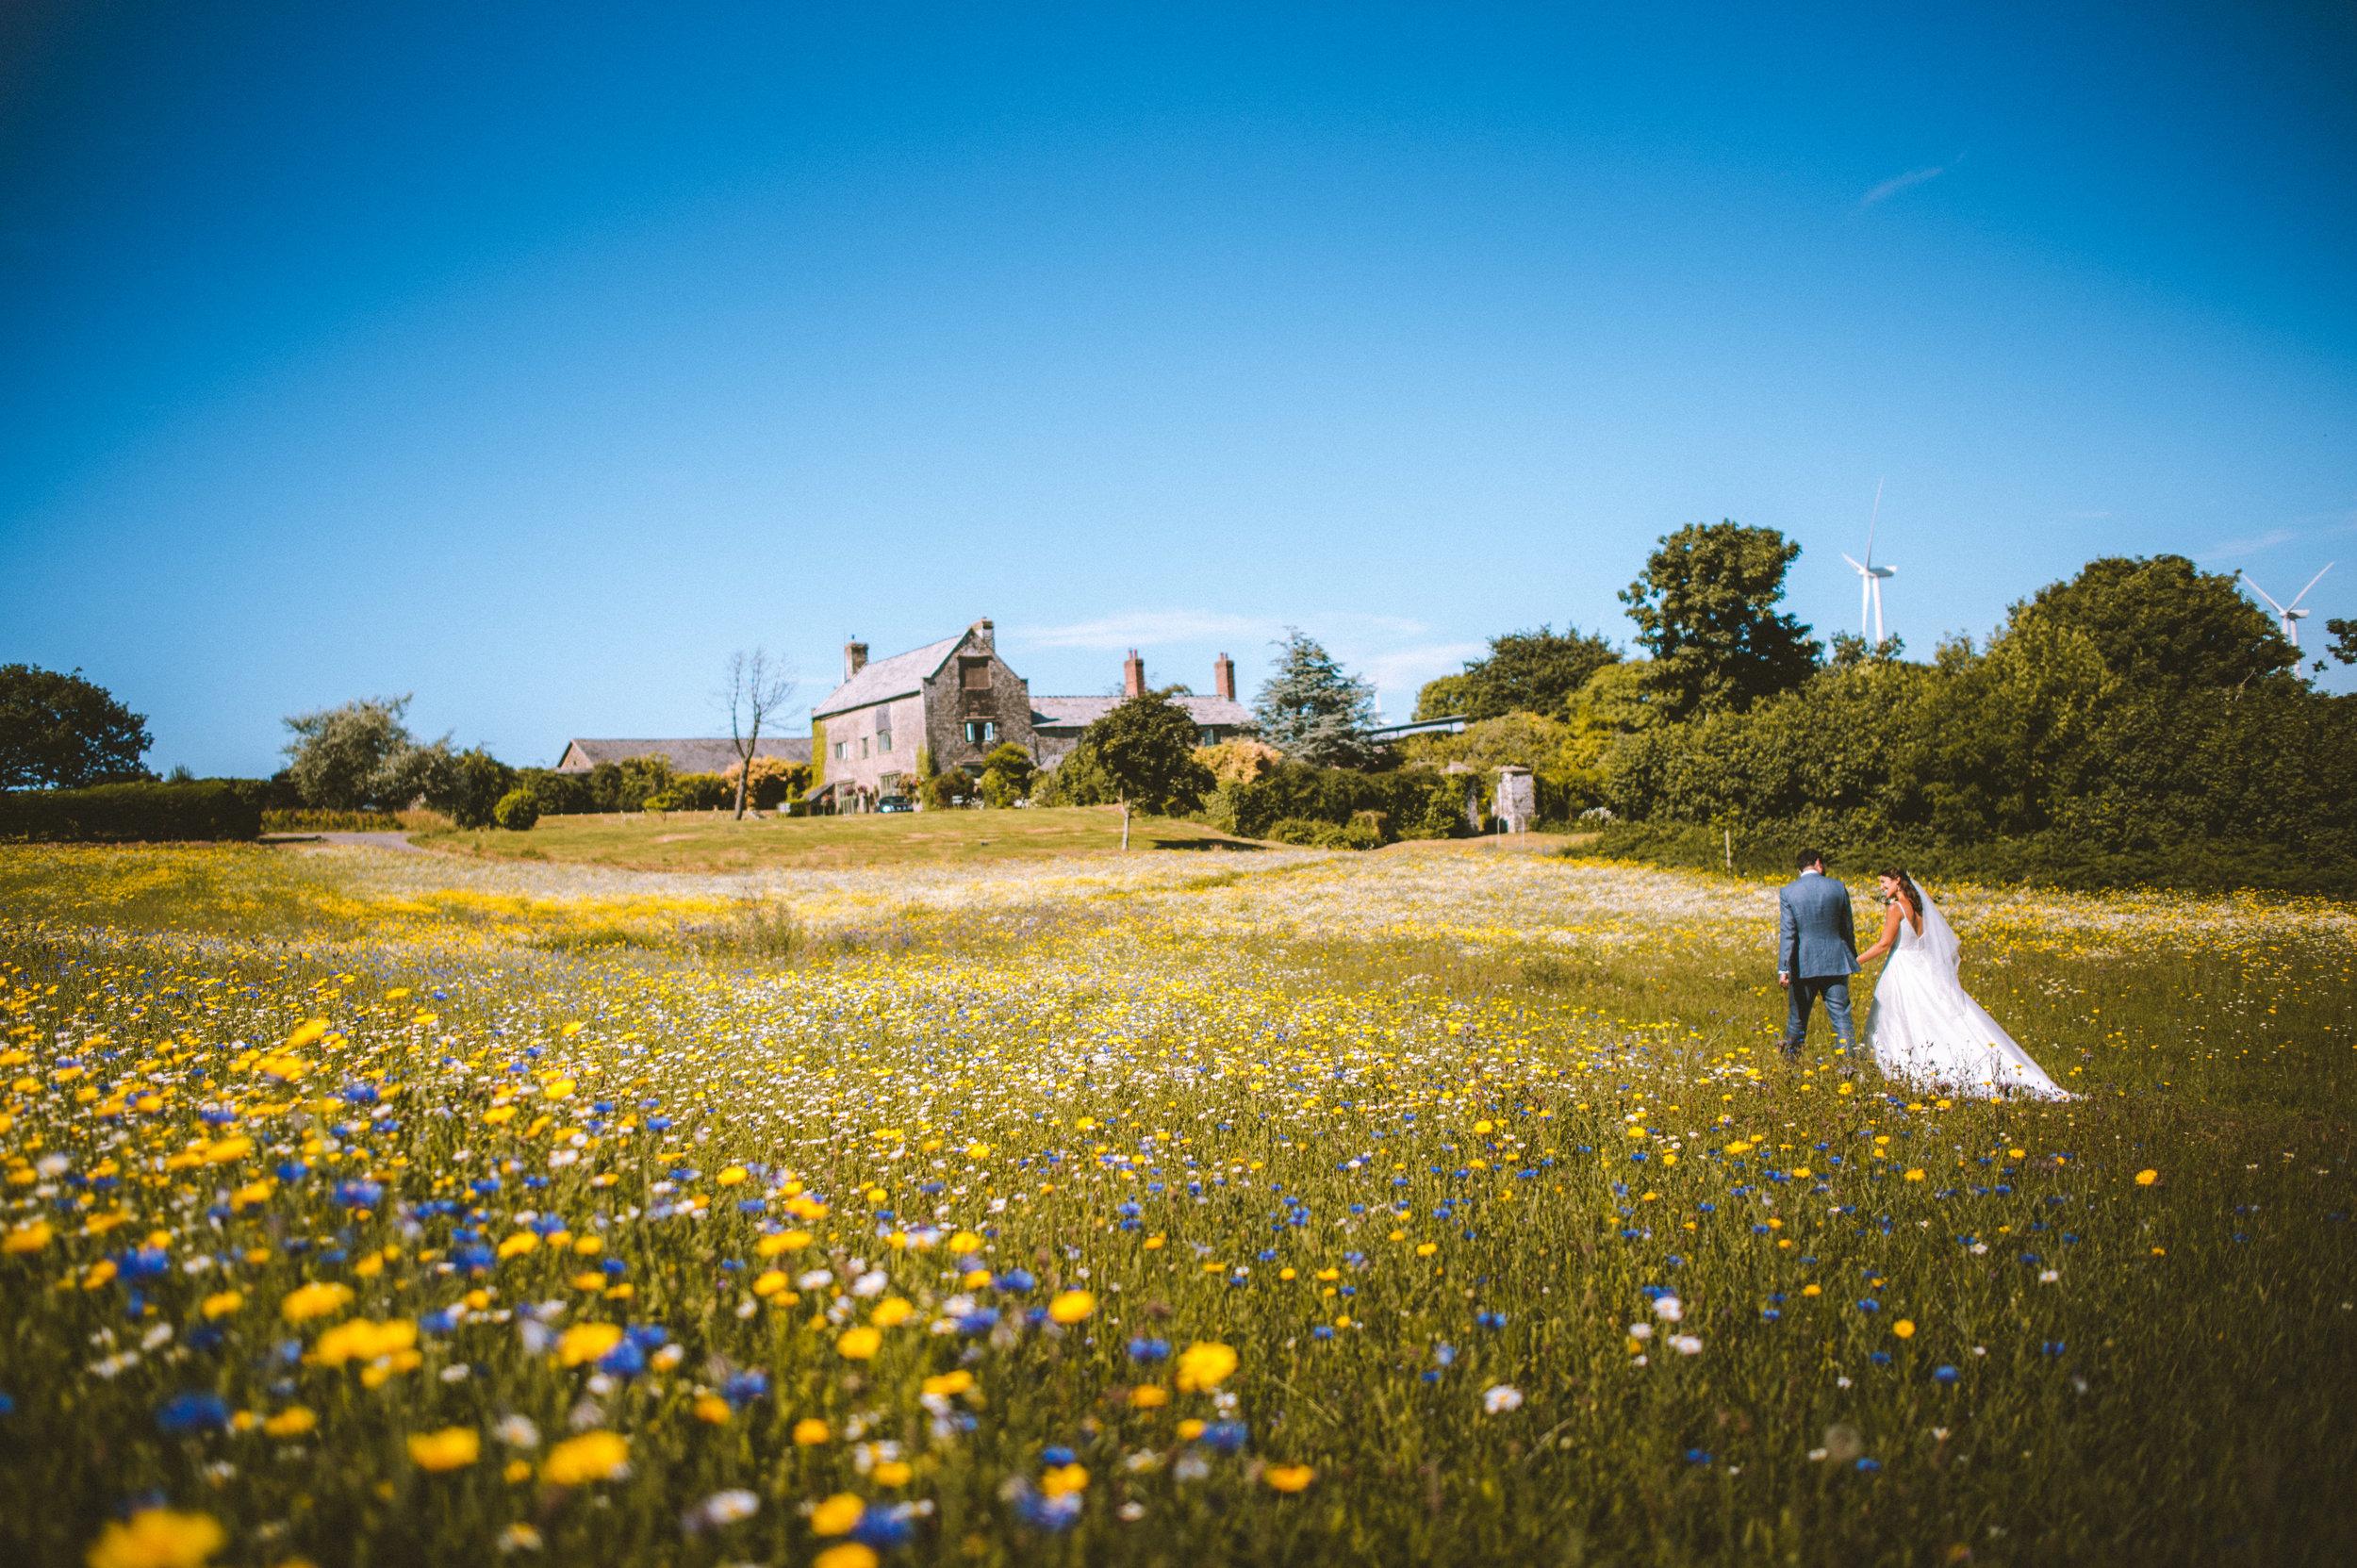 ash-barton-estate-wedding-photographer-mark-shaw-33.jpg